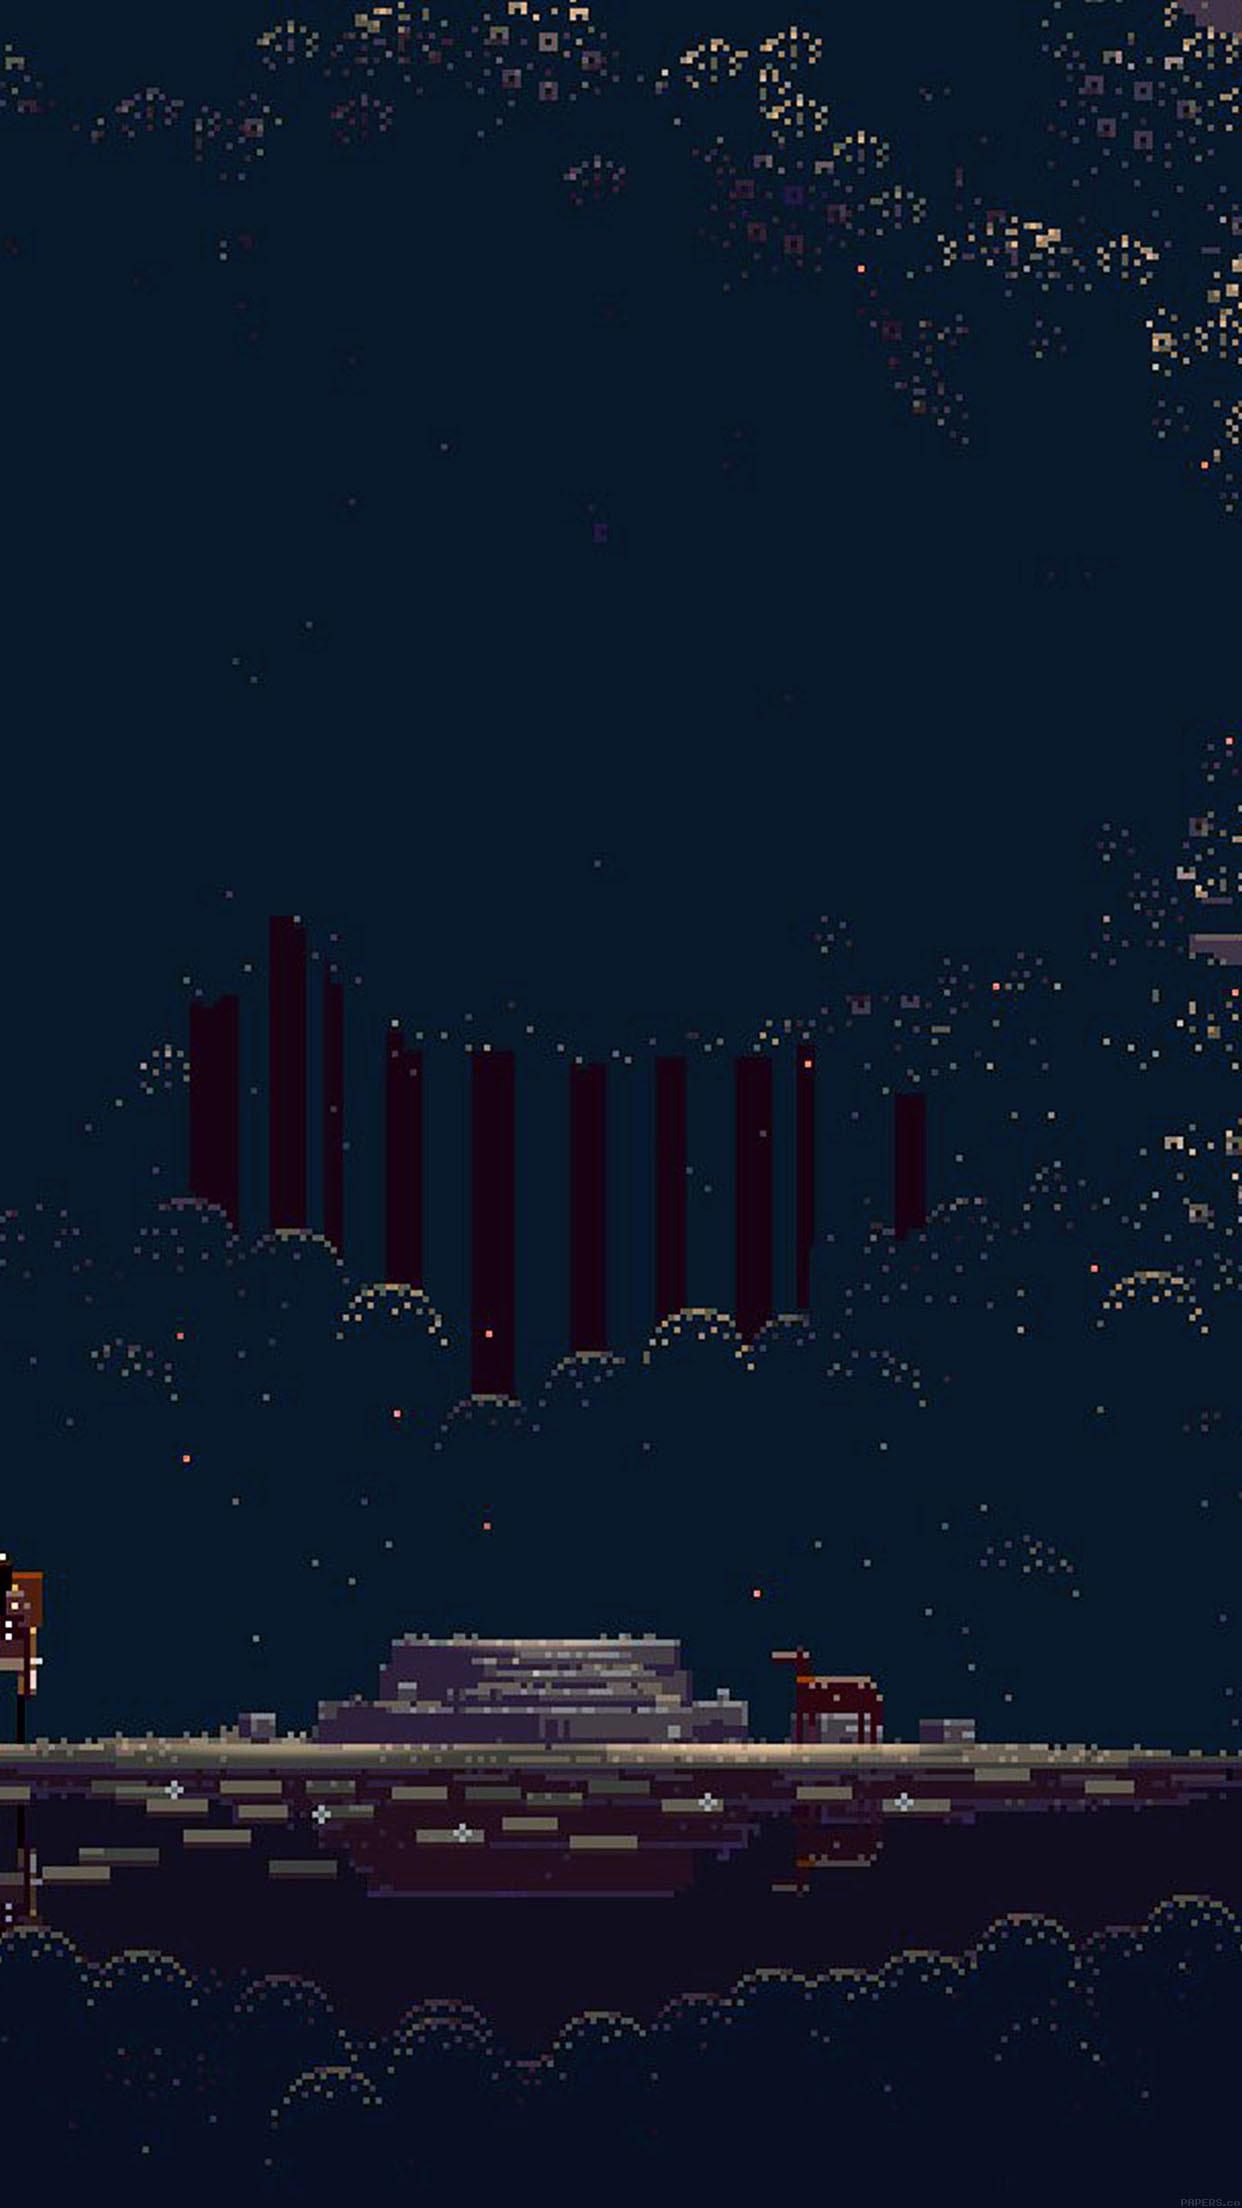 wallpaper-pixelated-universe-game-34-iphone6-plus-wallpaper.